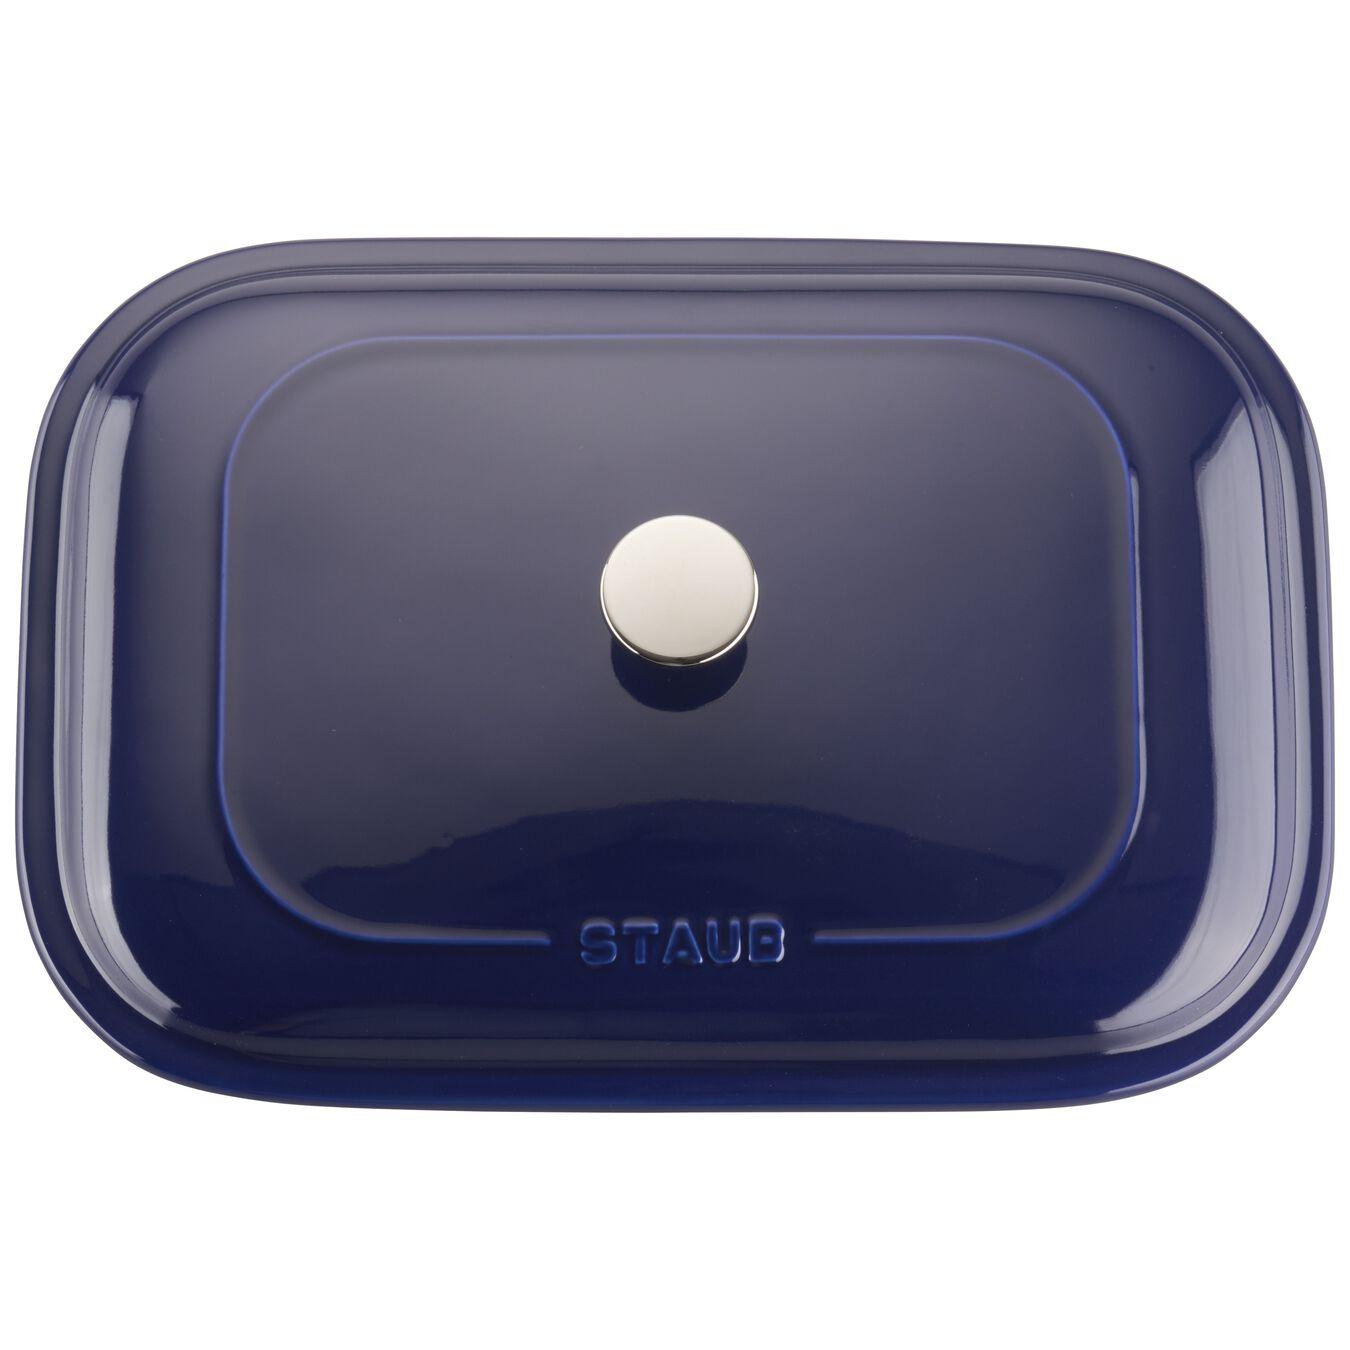 Ceramic rectangular Moules de forme spéciale, Dark-Blue,,large 2